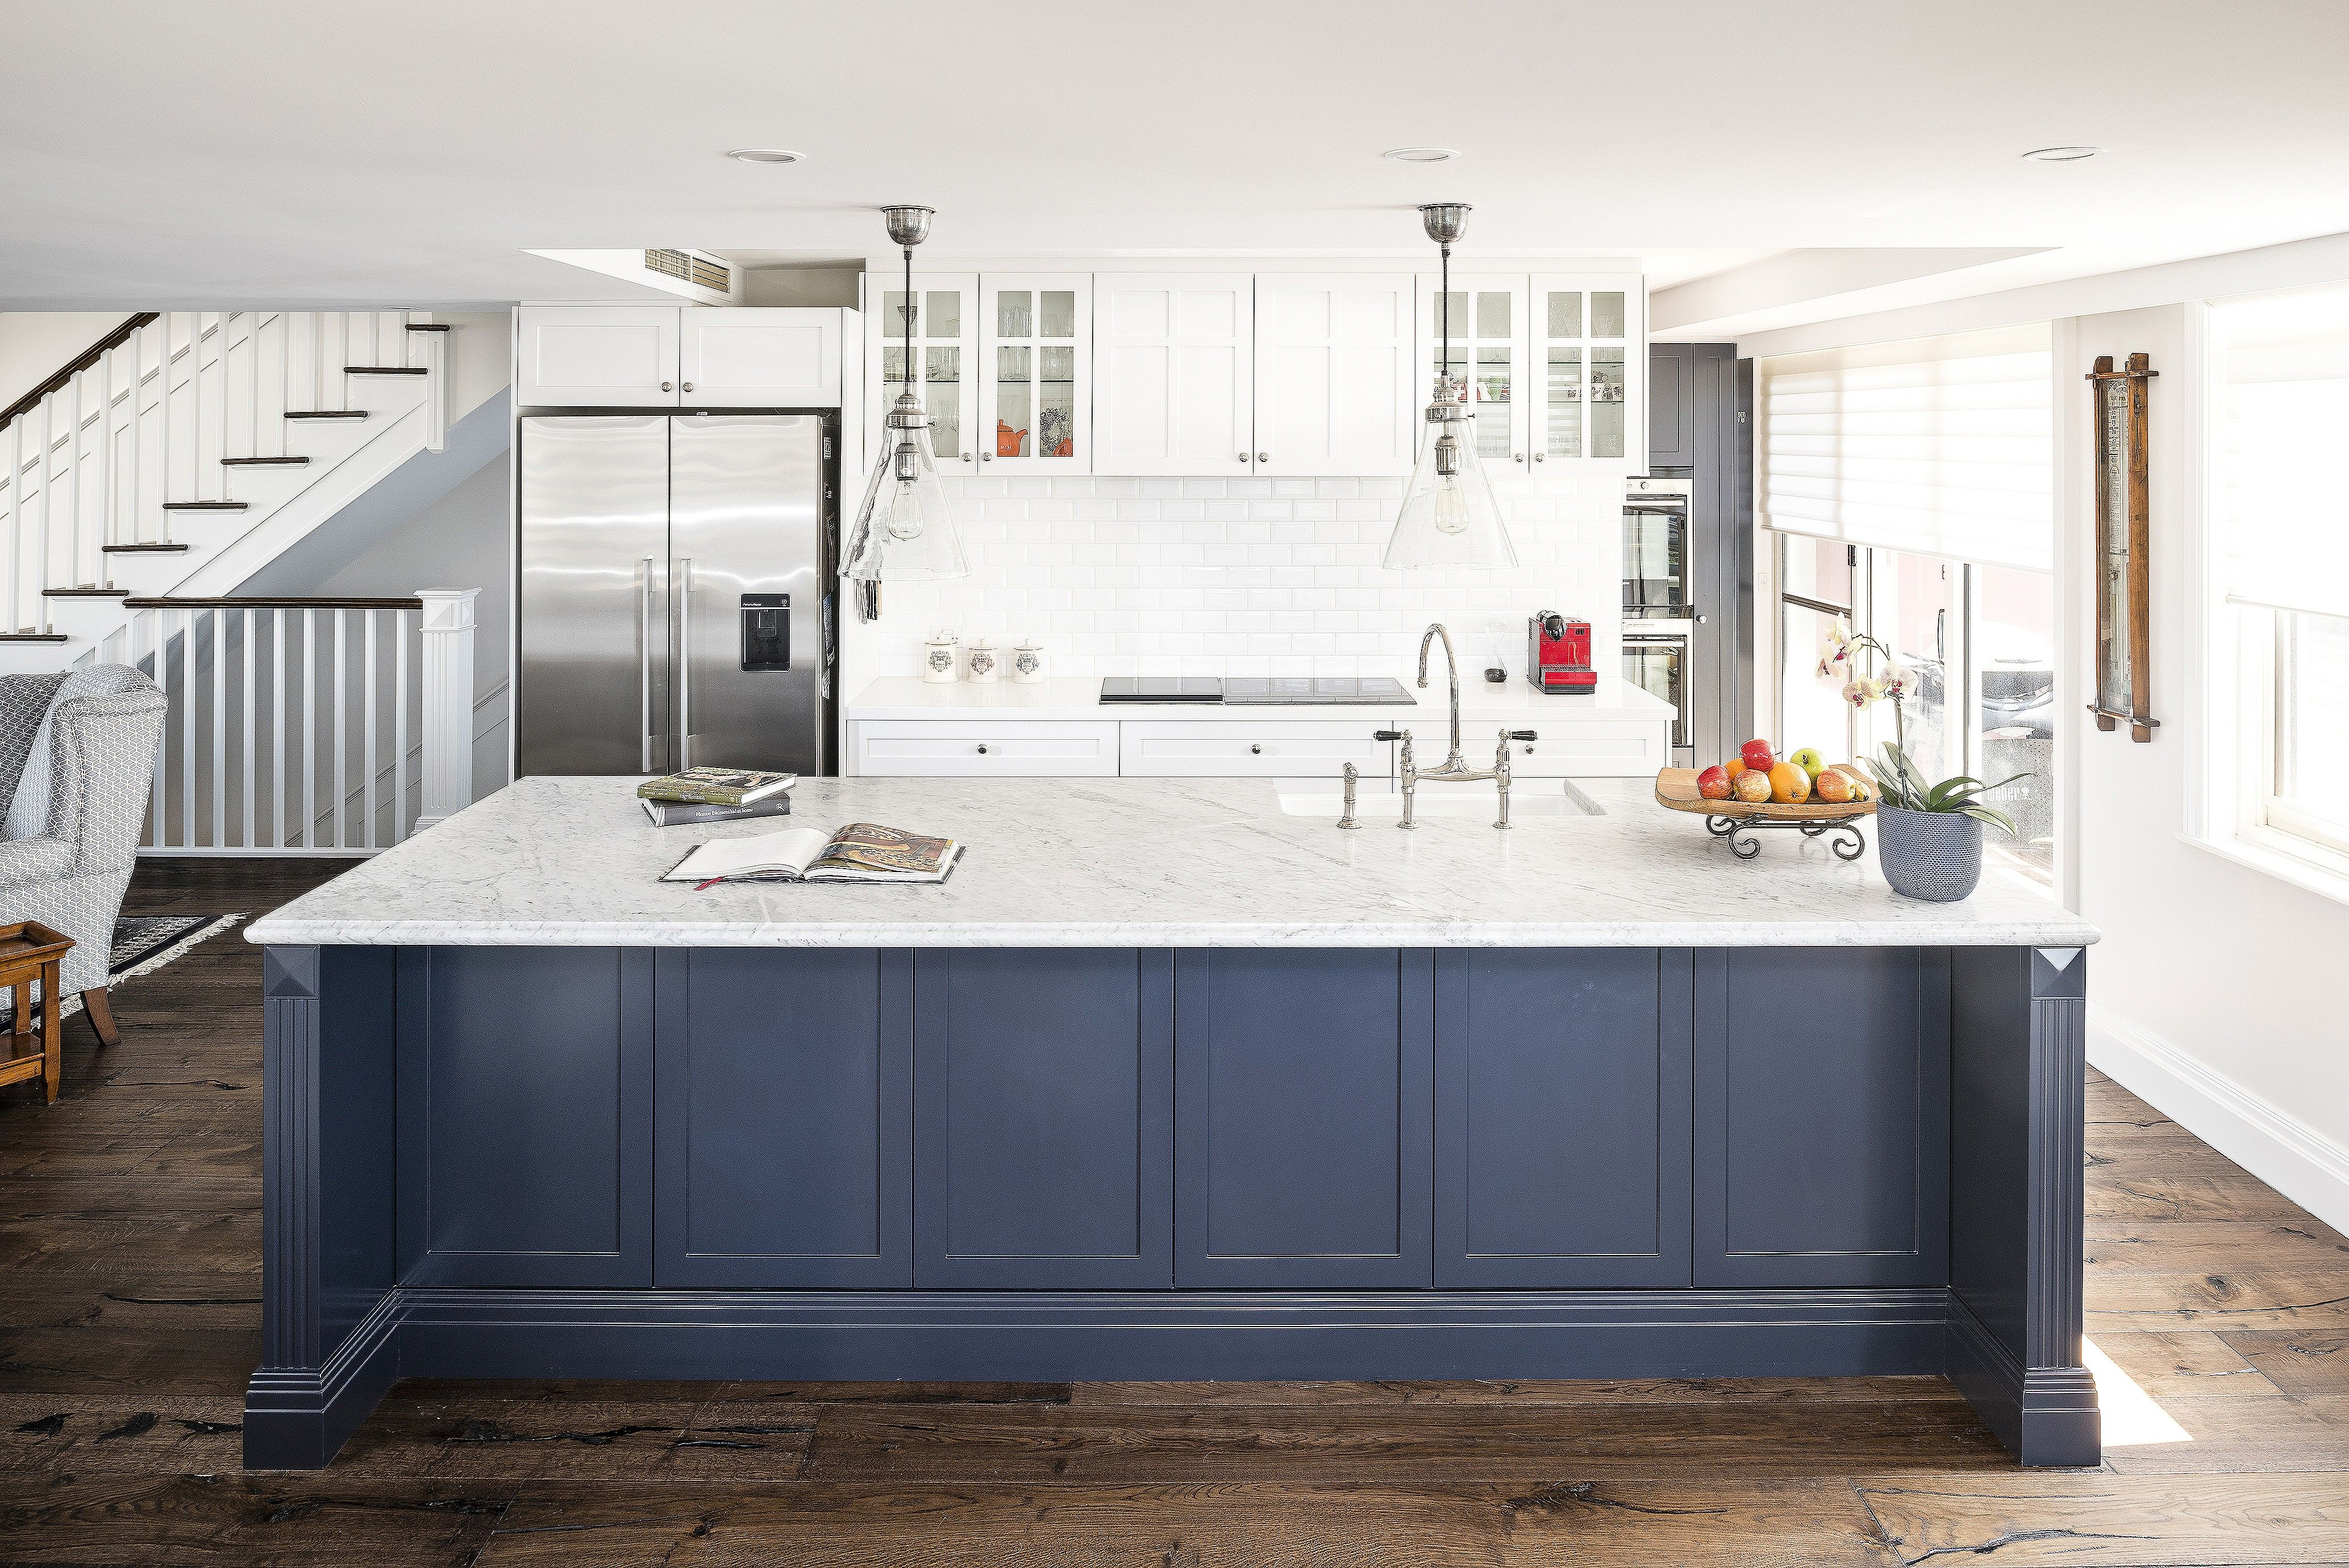 Kitchen Renovations Ideas Lovely Kitchen Hamptons Ideas Galley